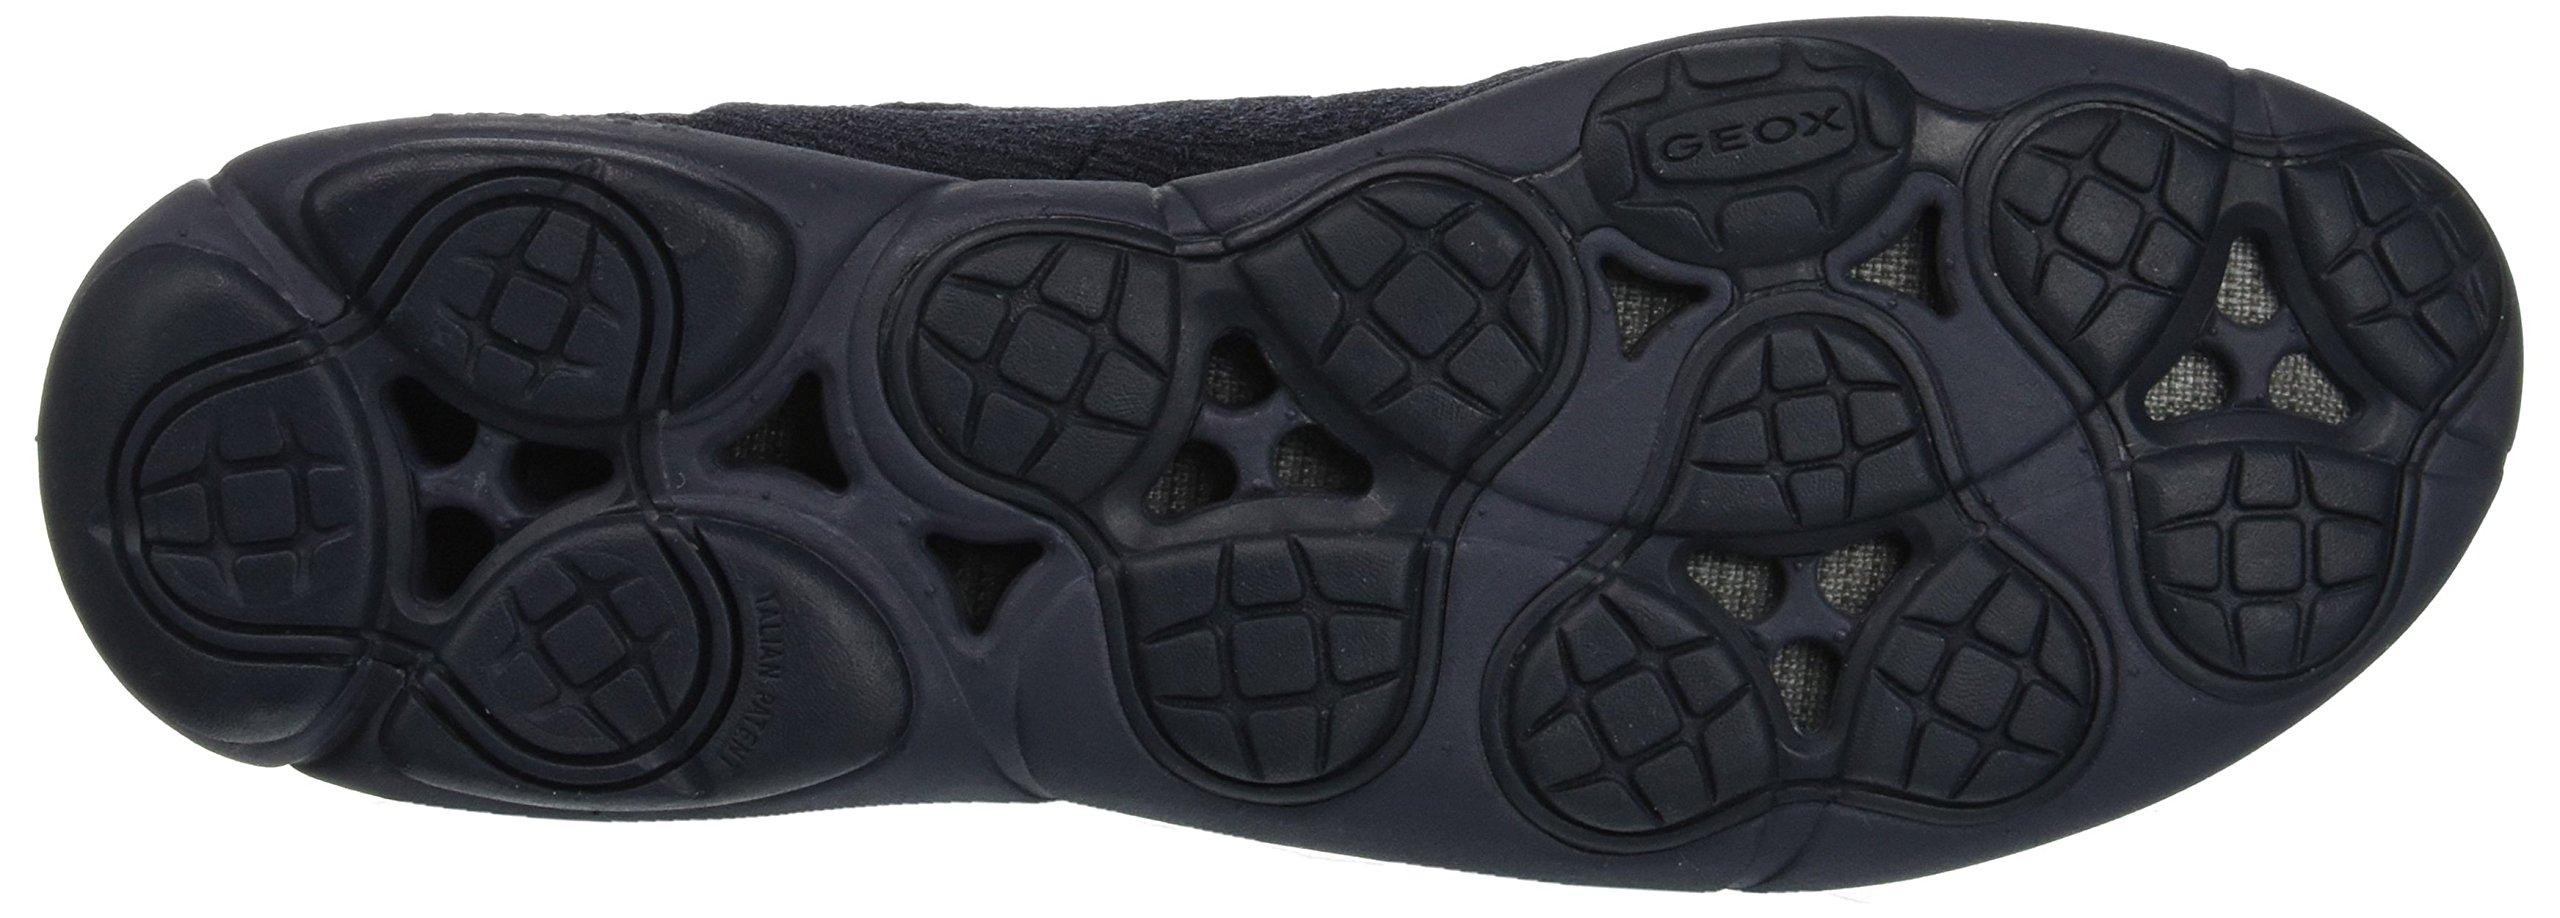 Geox Damen D Nebula C Sneaker 34